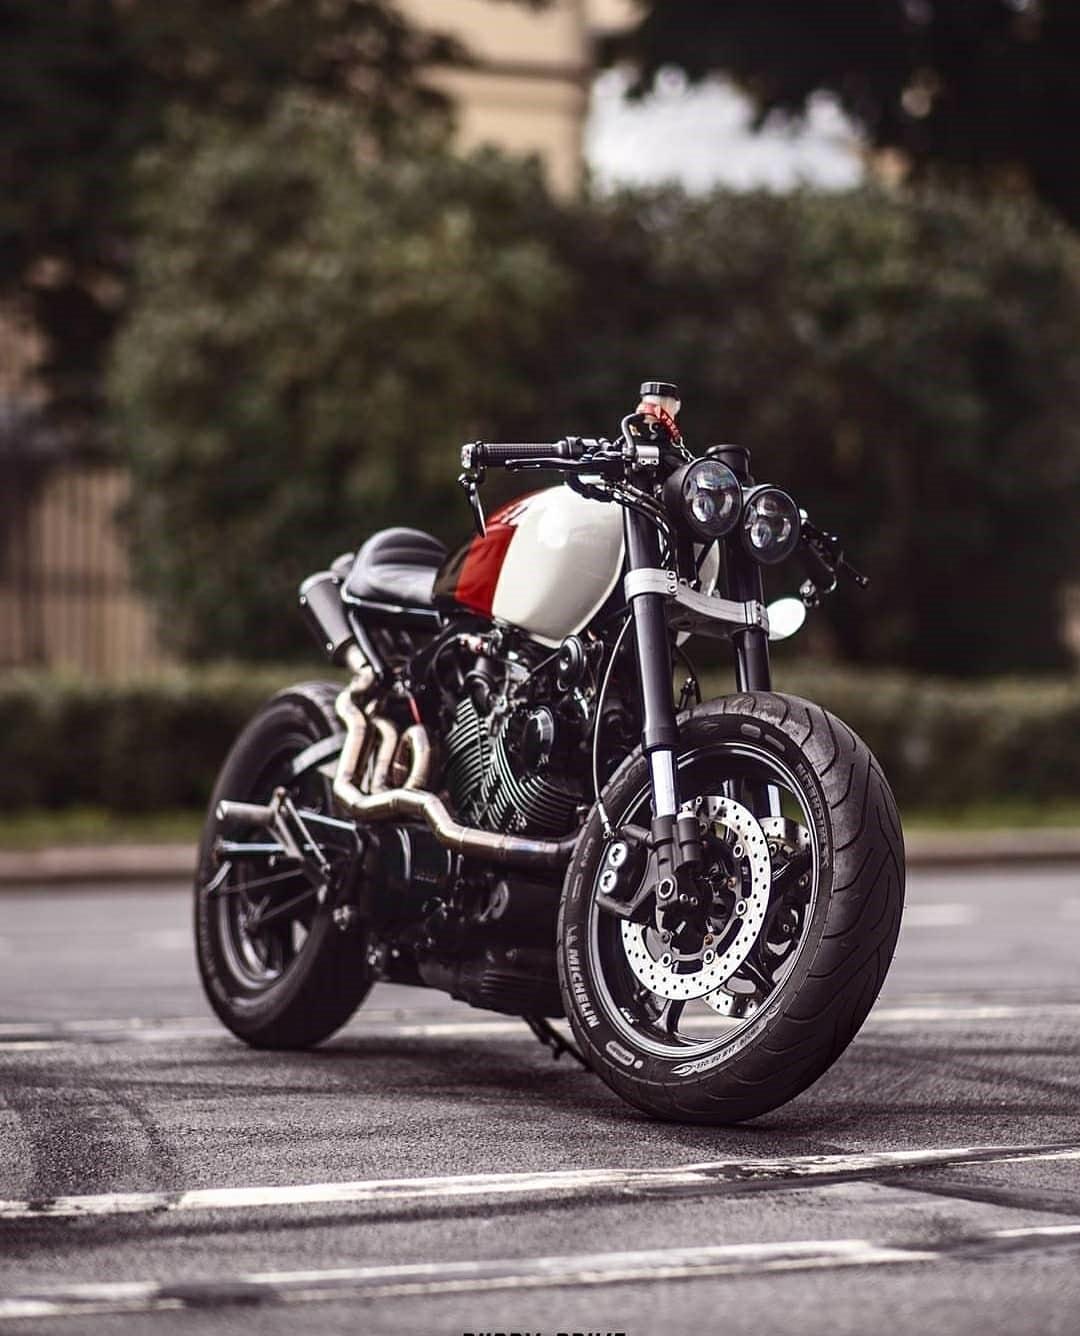 custom cafe style motorcycle